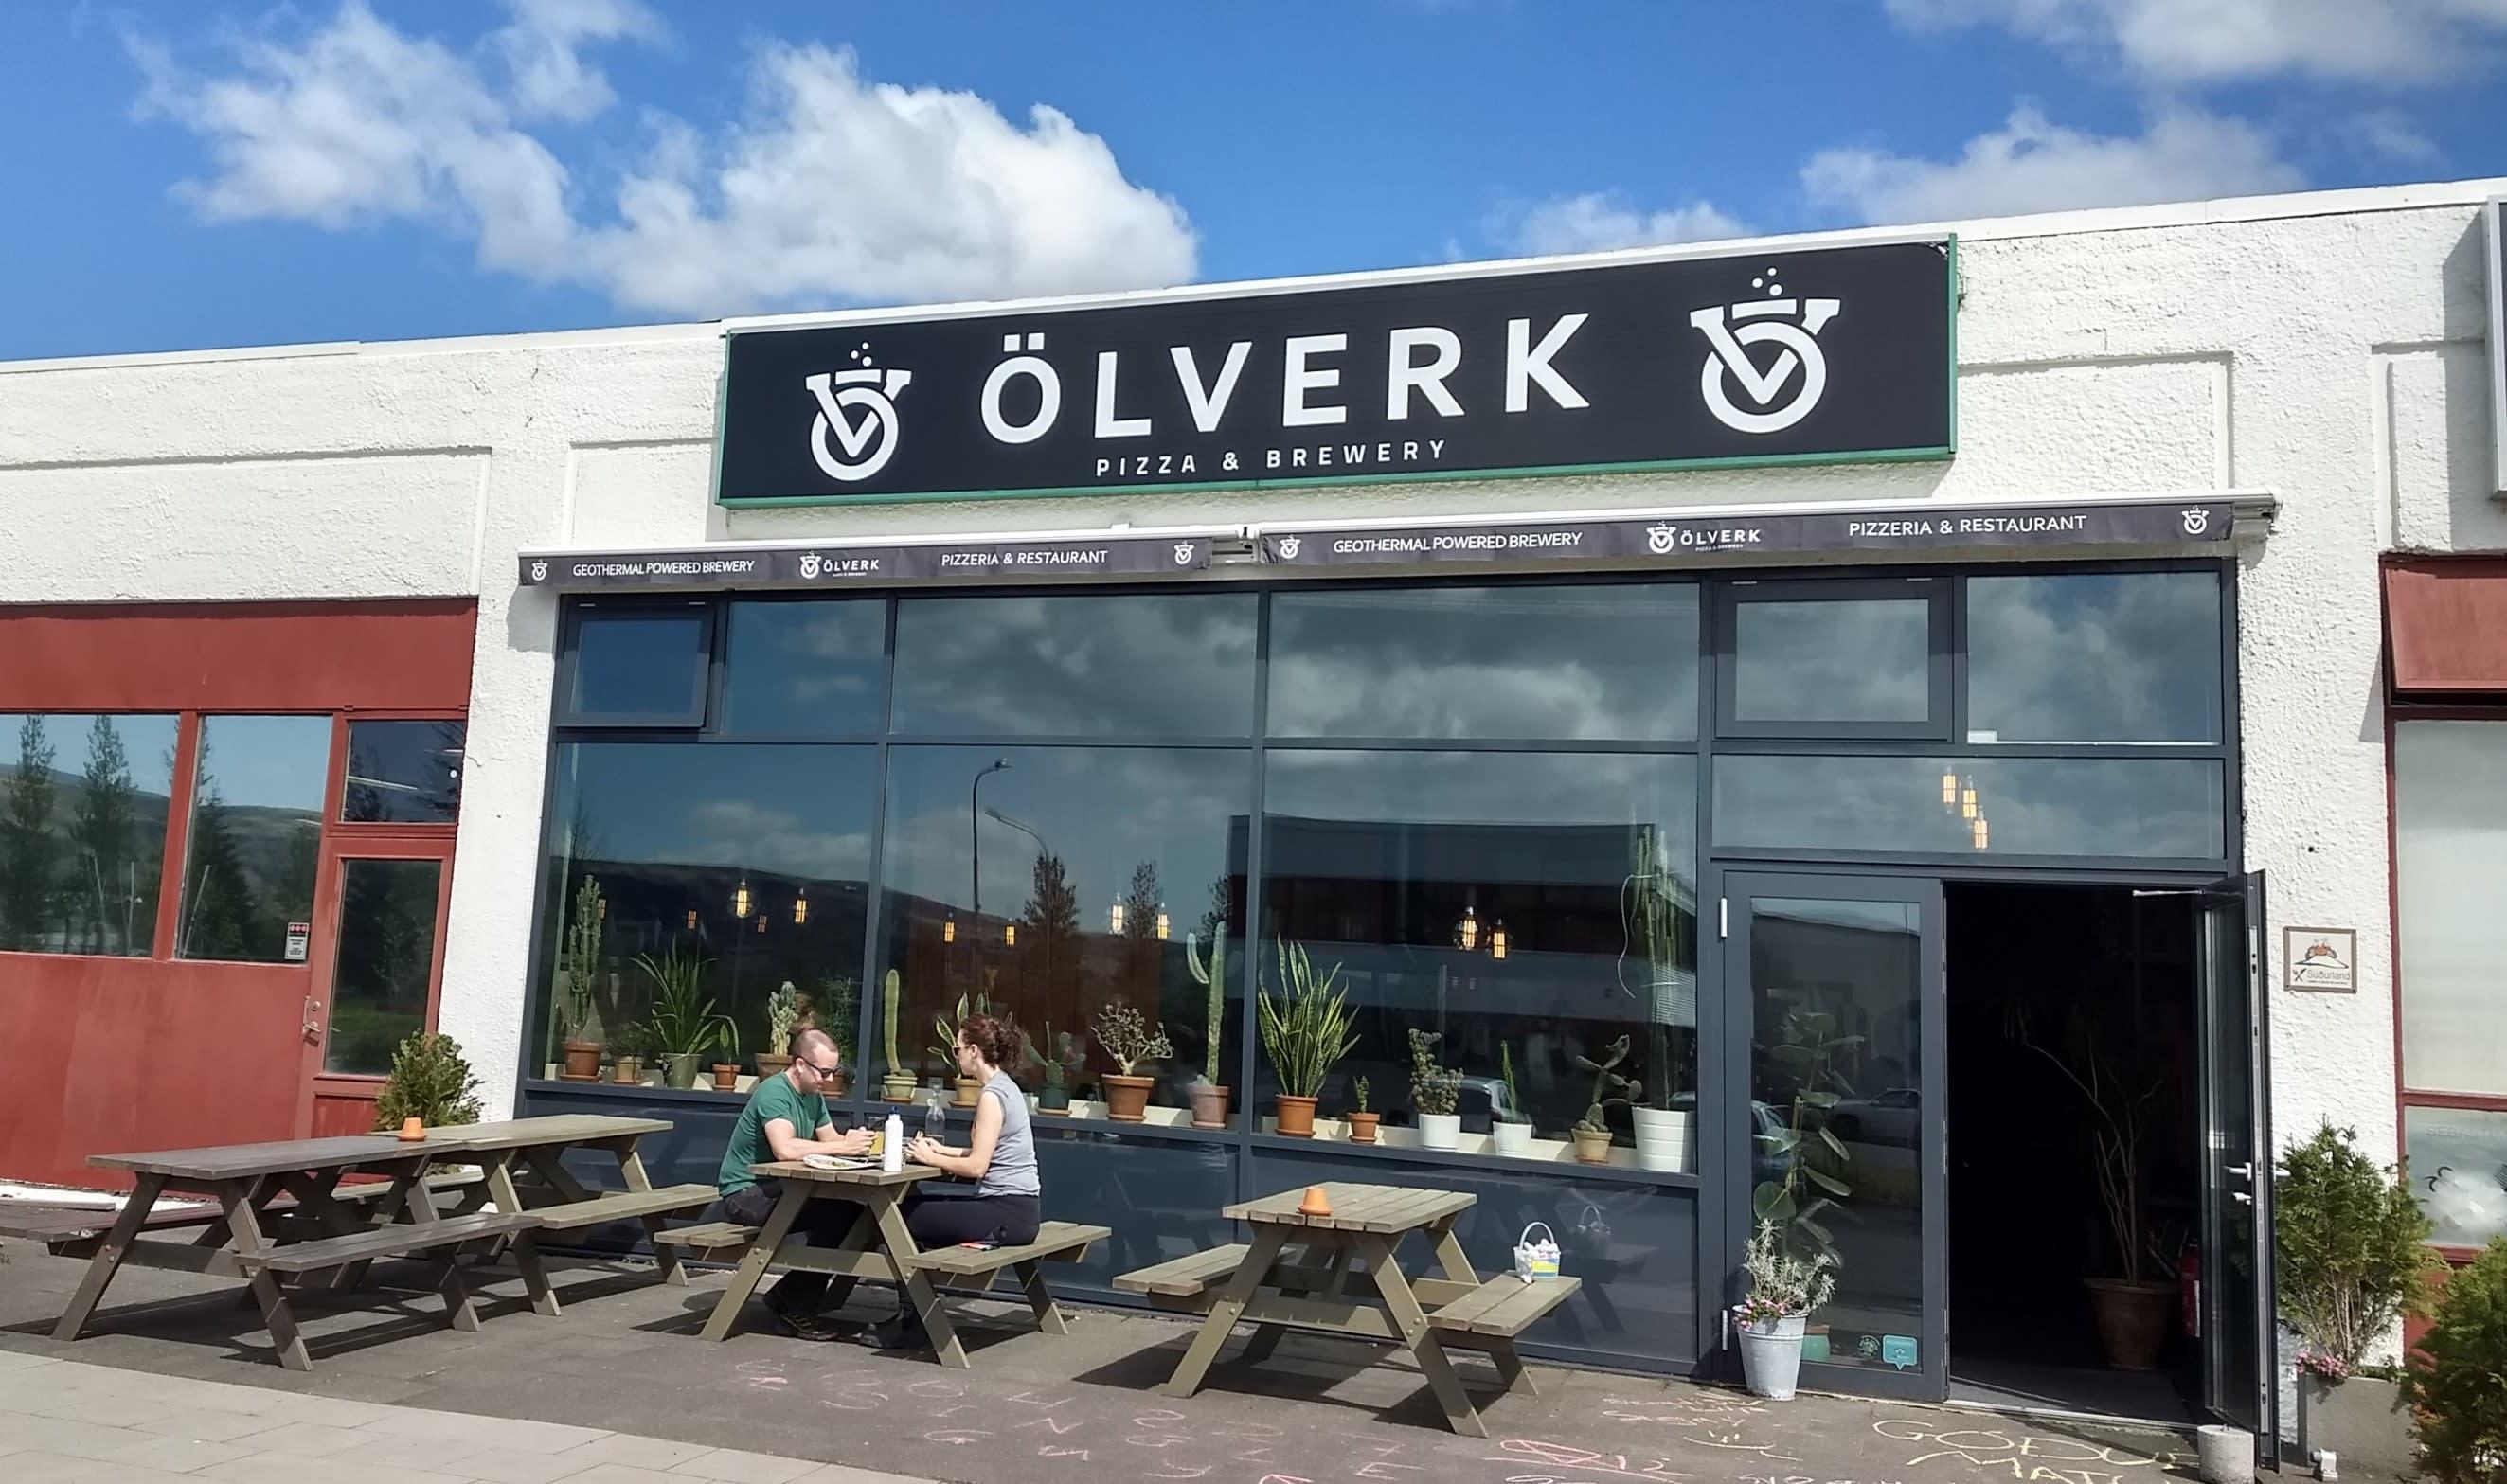 two people enjoy beer and pizza outside Olverk brewery in Hveragerdi in Iceland